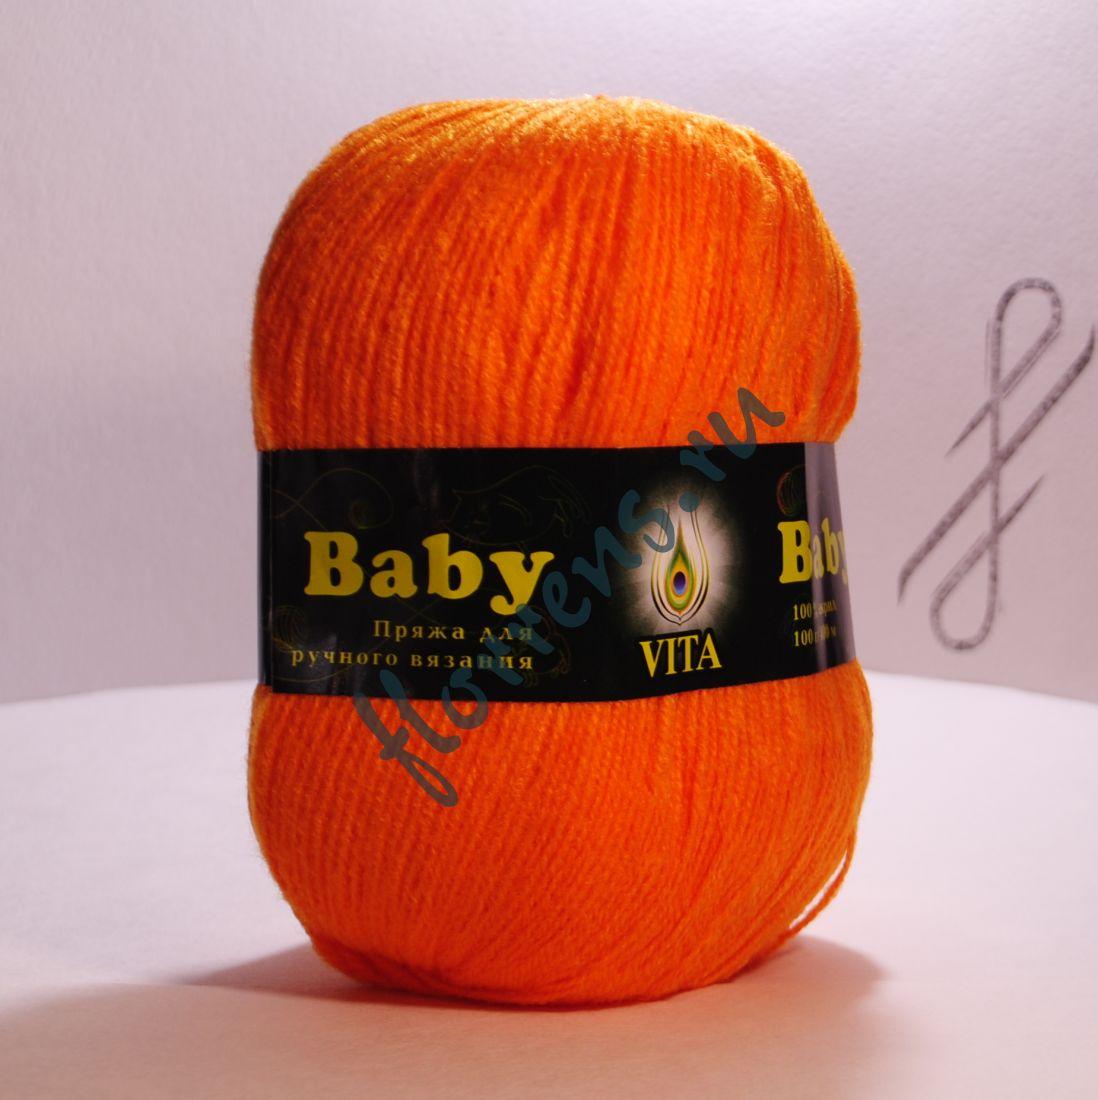 Пряжа Baby / 2865 оранжевый